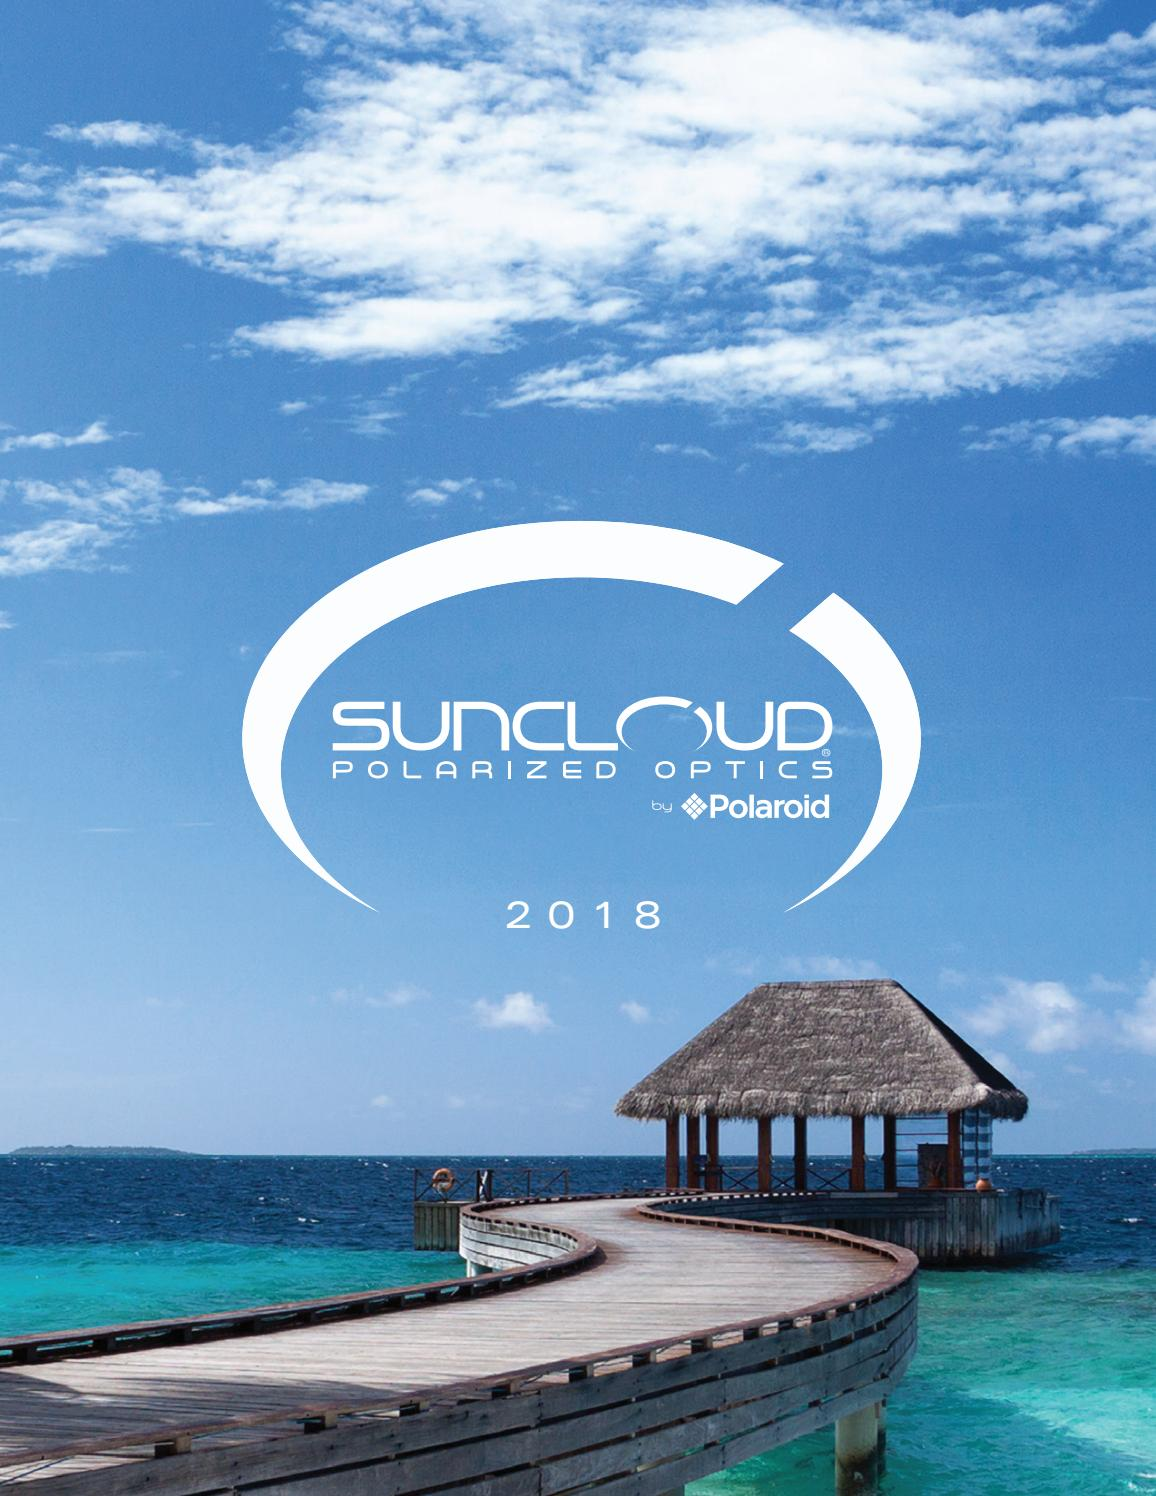 Suncloud Loveseat Polarized Sunglasses Matte-Tortoise /& Pink Fade /& Brown Lens